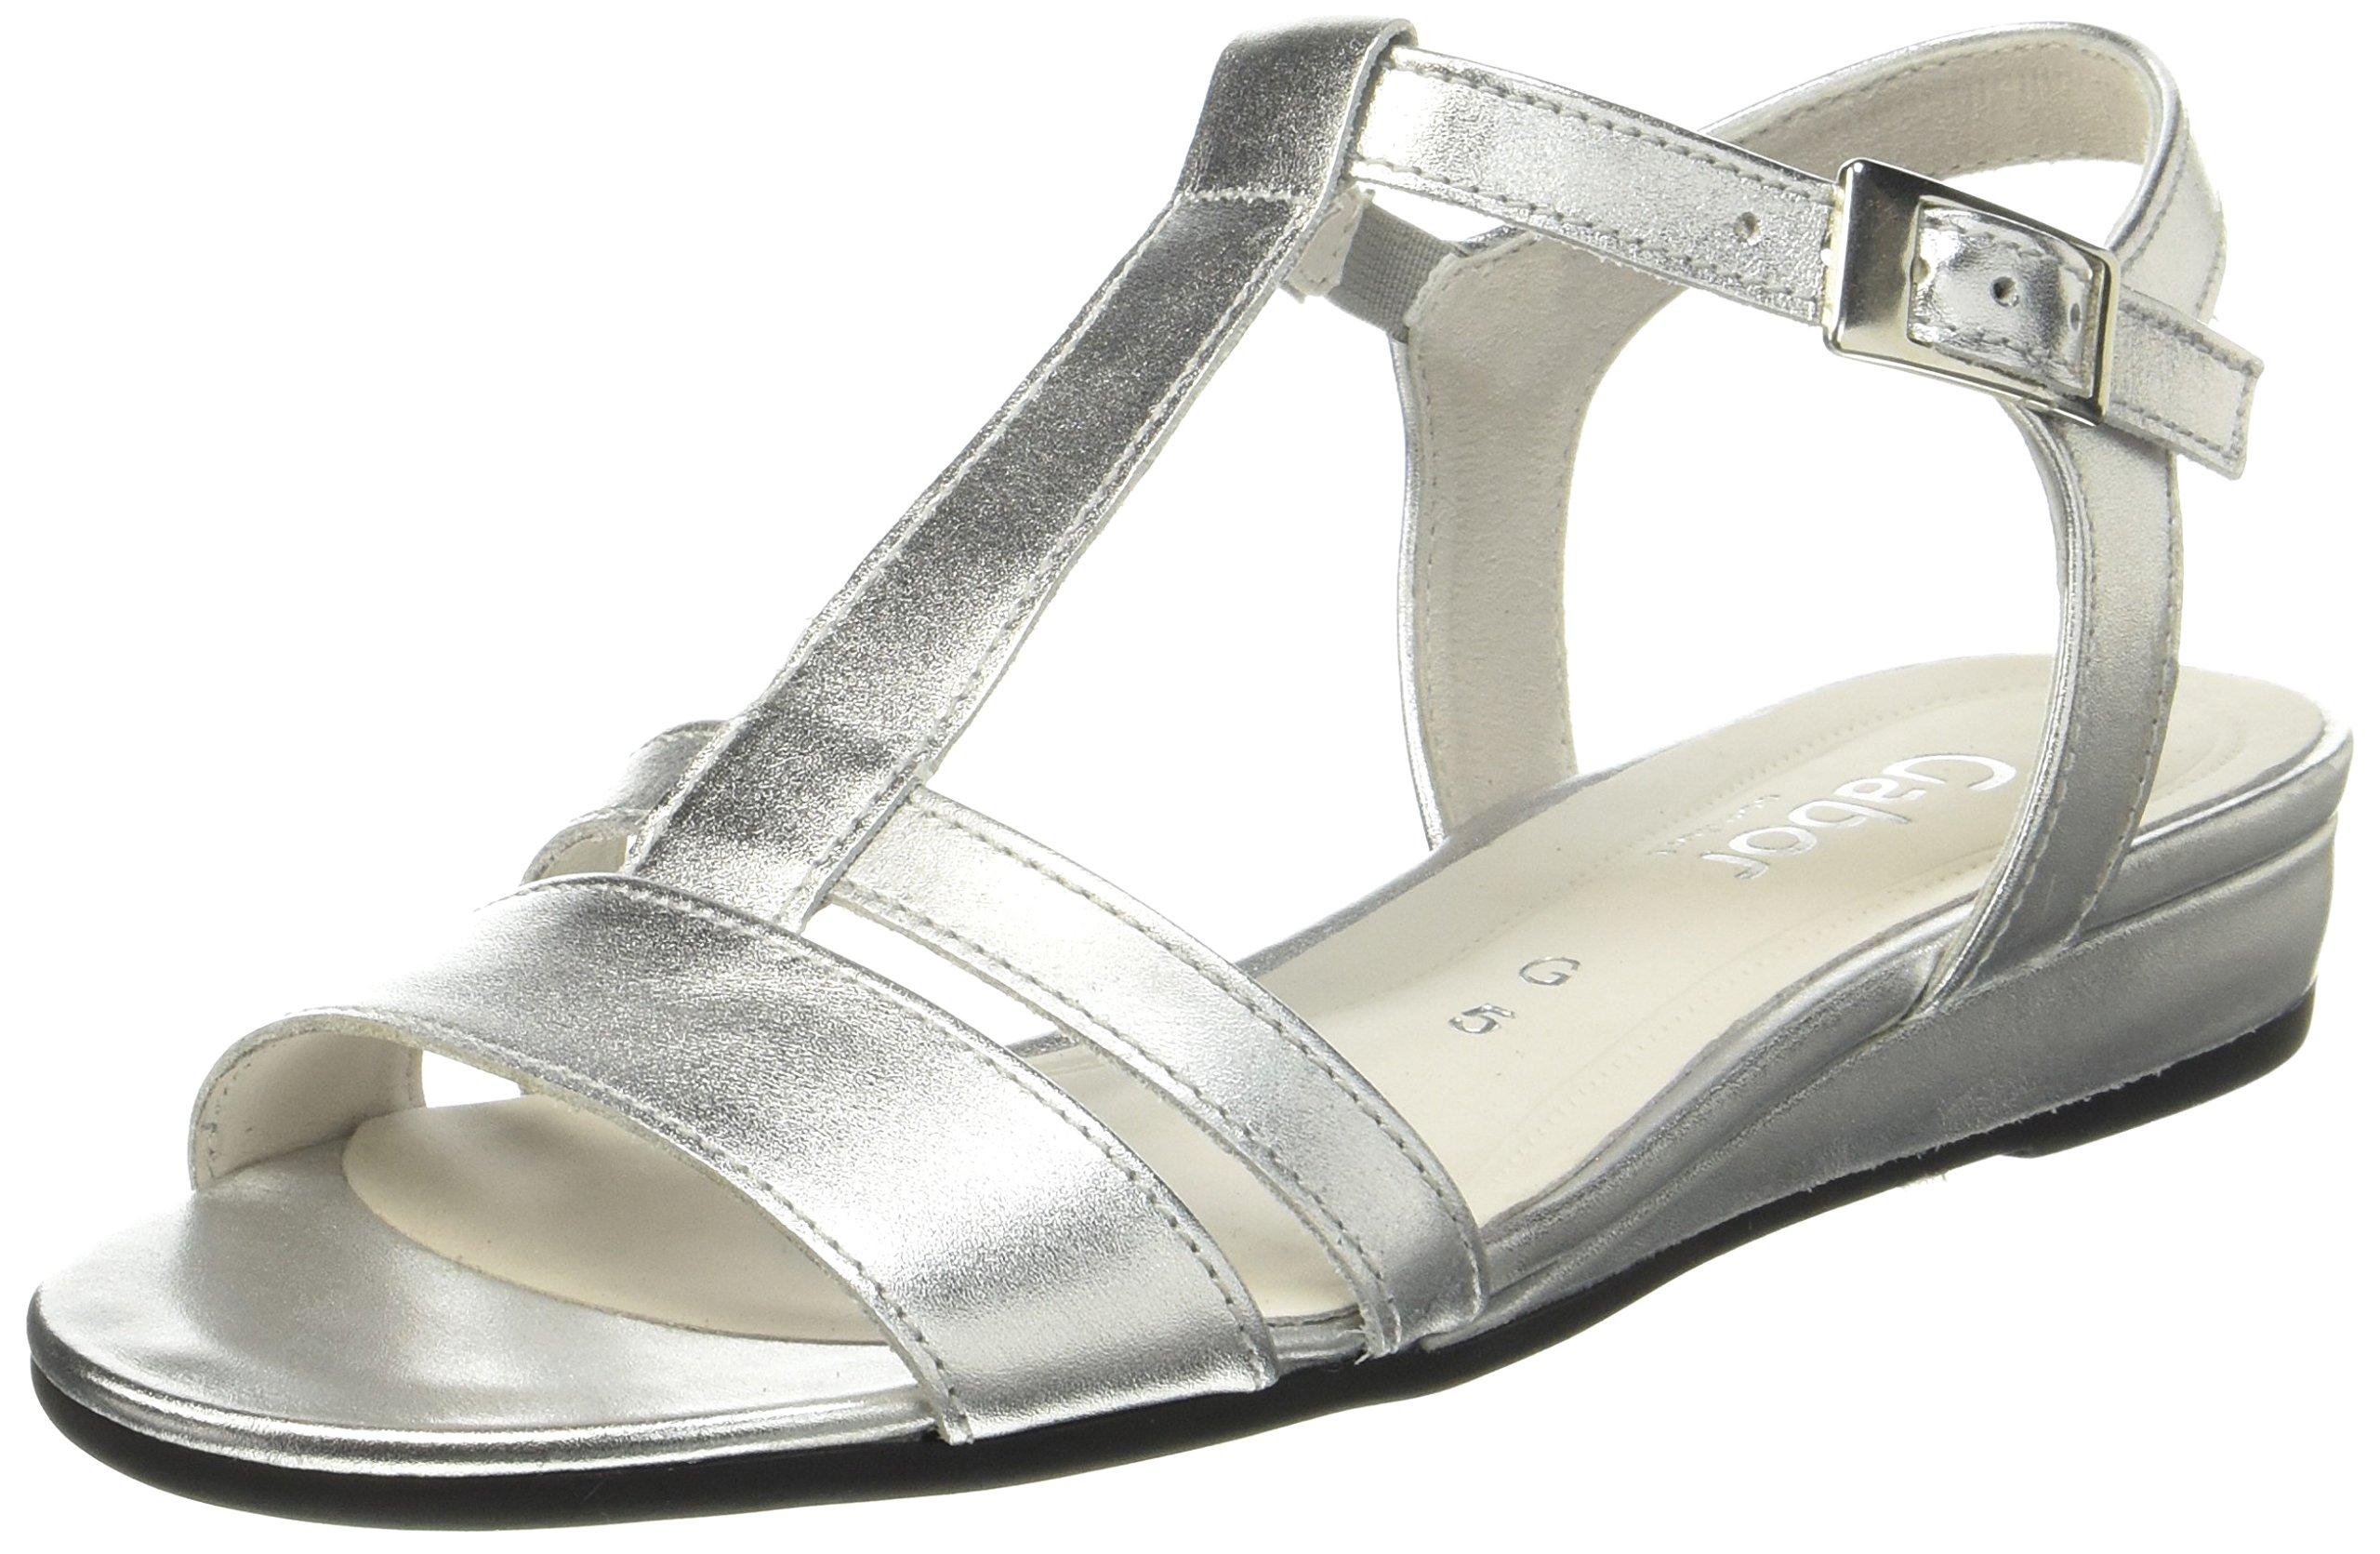 Eu Bride Gabor SportSandales Cheville FemmeMulticoloresilber39 Shoes Comfort wO0n8Pk